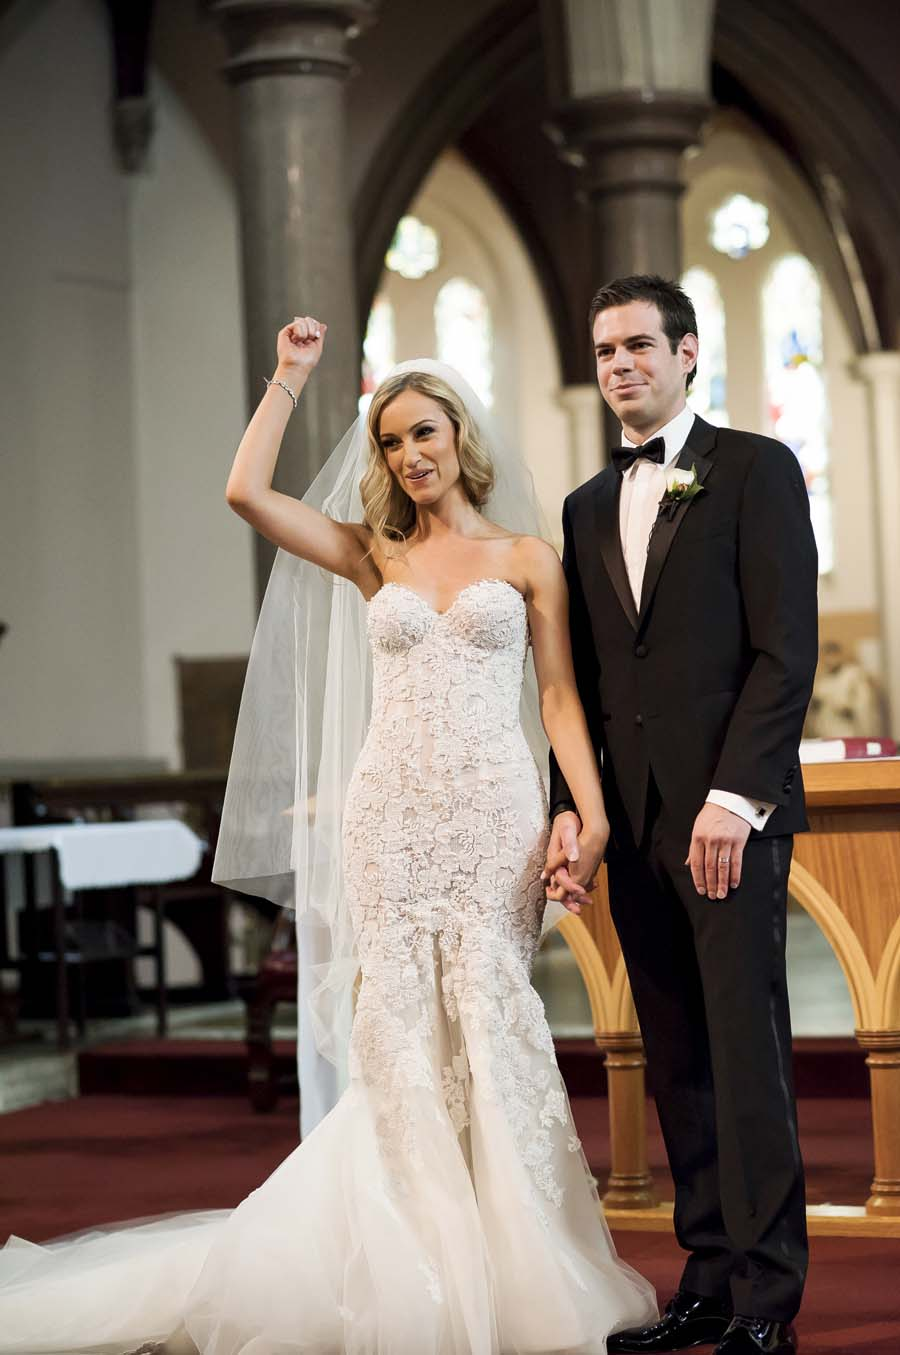 White Floral Wedding With Stunning Floral Embellished Wedding Dress ...